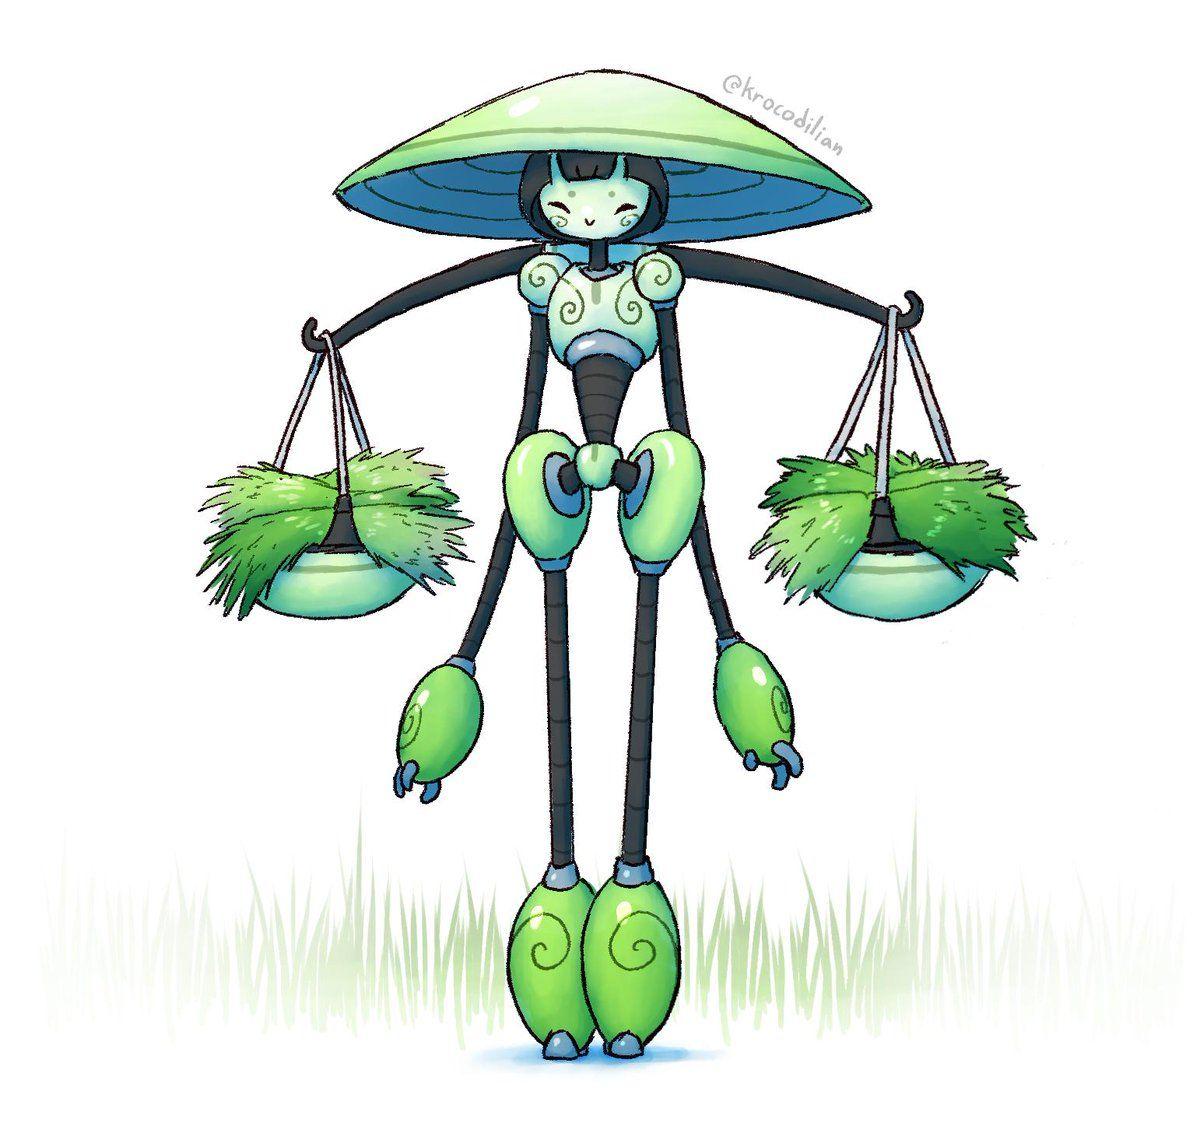 Kroco on in 2019 Character design, Twitter, Sci fi